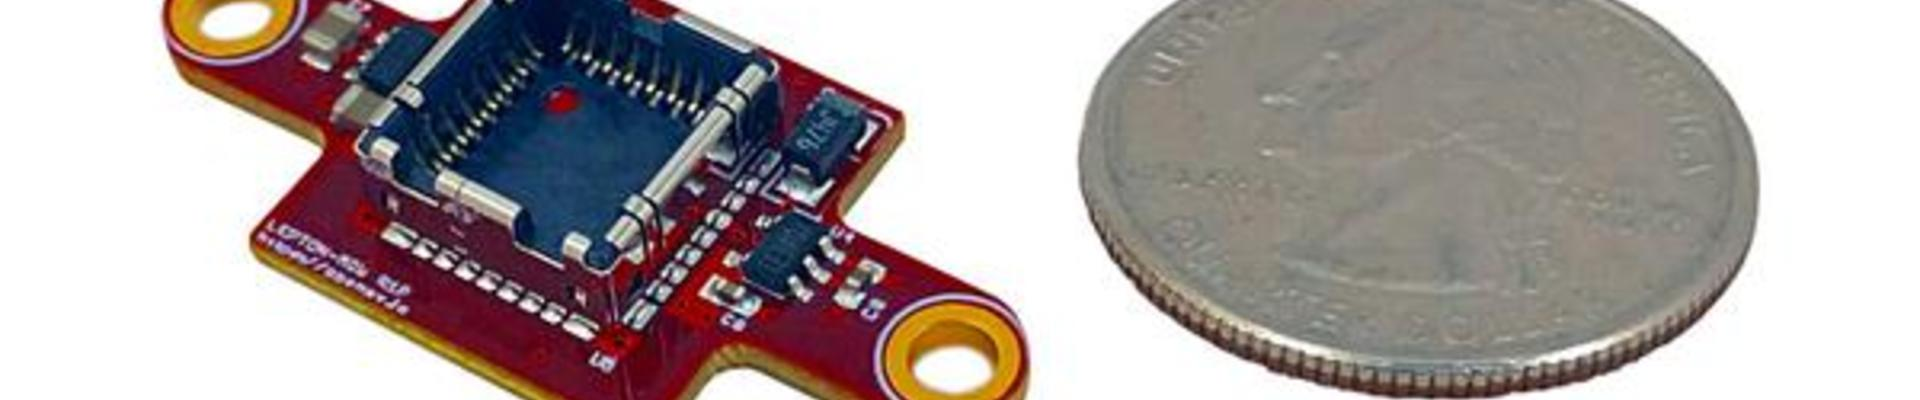 FLIR Lepton Adapter Module